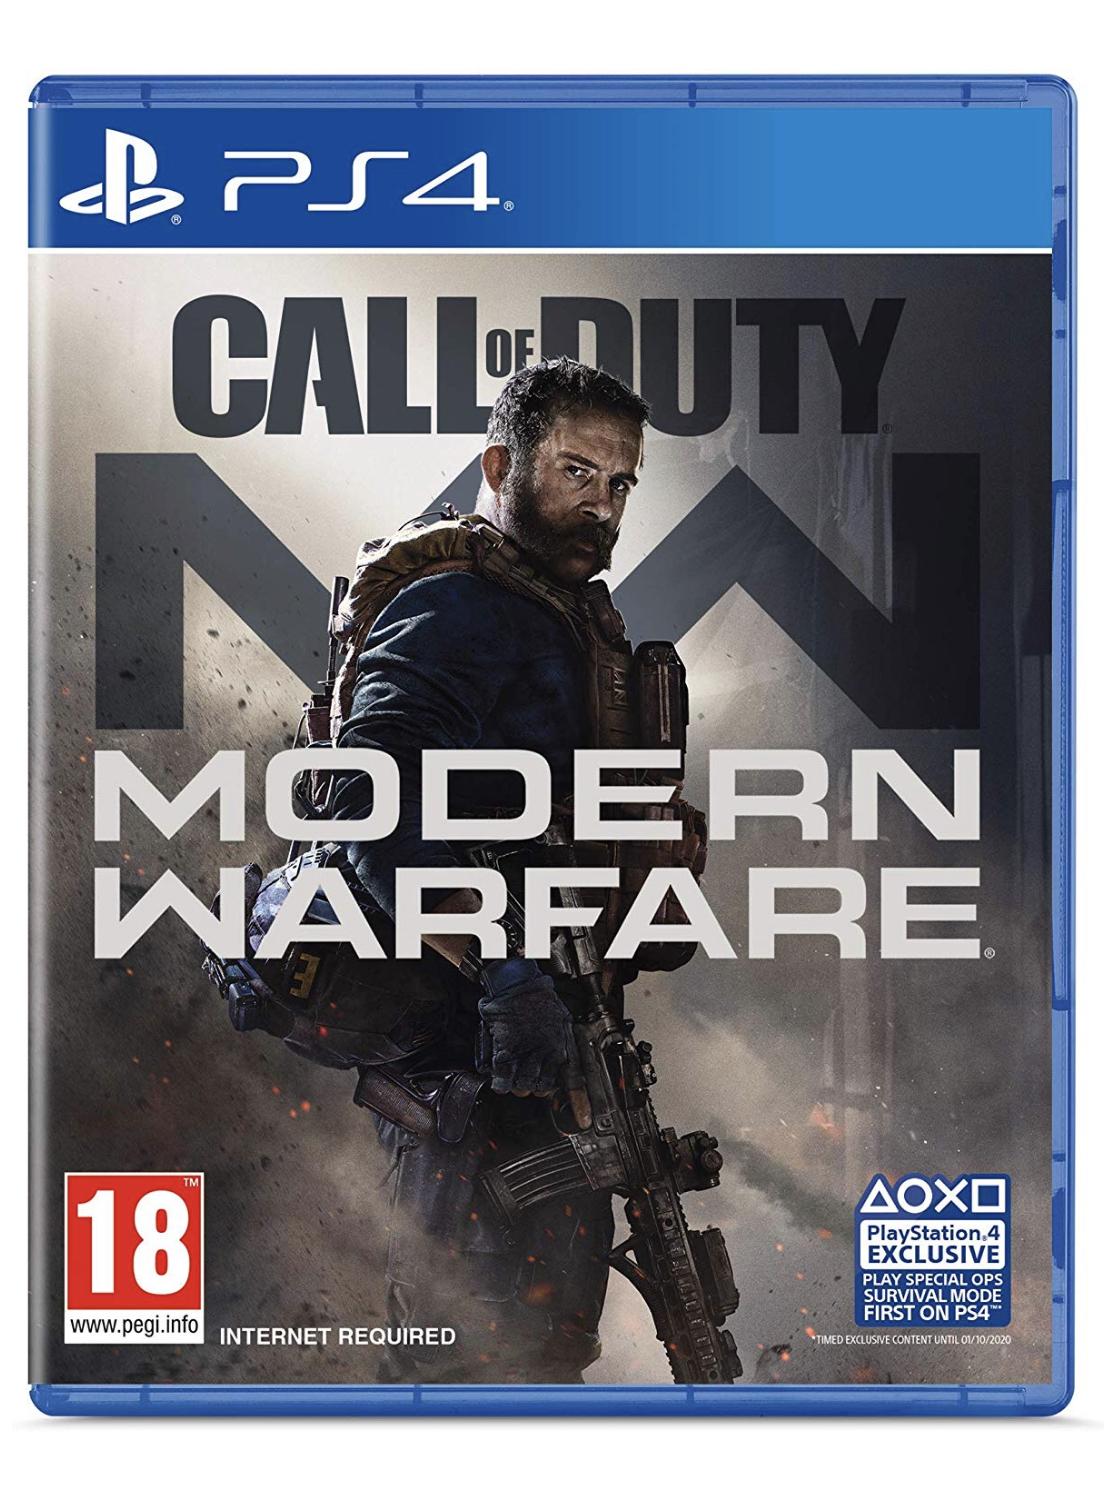 Call of Duty: Modern Warfare Standard Editon PS4 & XBox One £34.99 @ Amazon